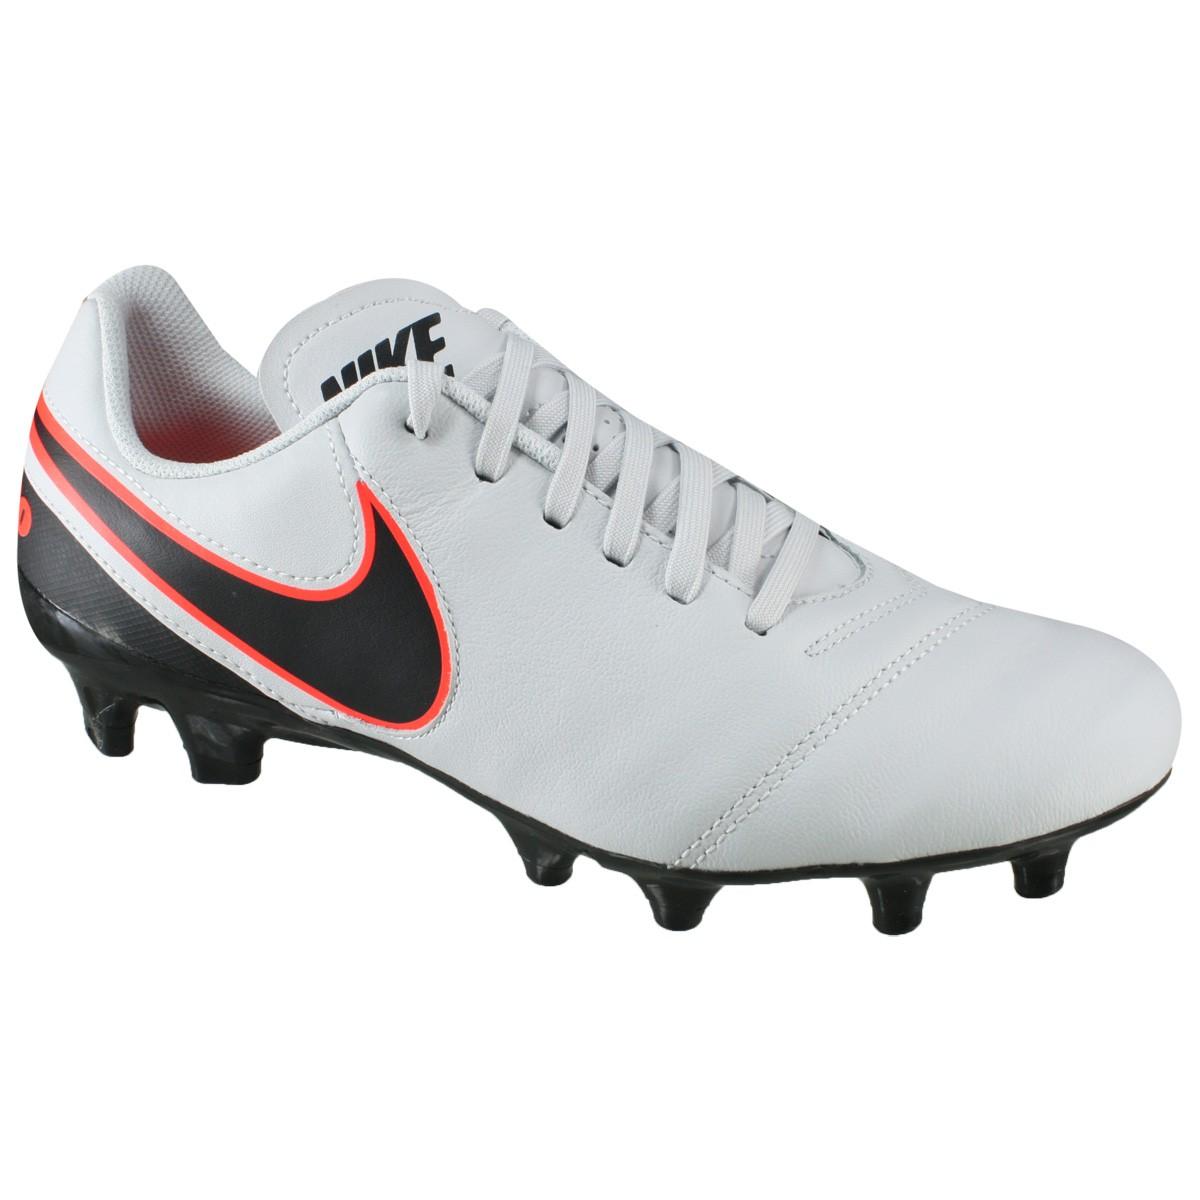 969c6bc3c8 Chuteira Nike Tiempo Genio II Leather FG 819213-001 - Cinza ...